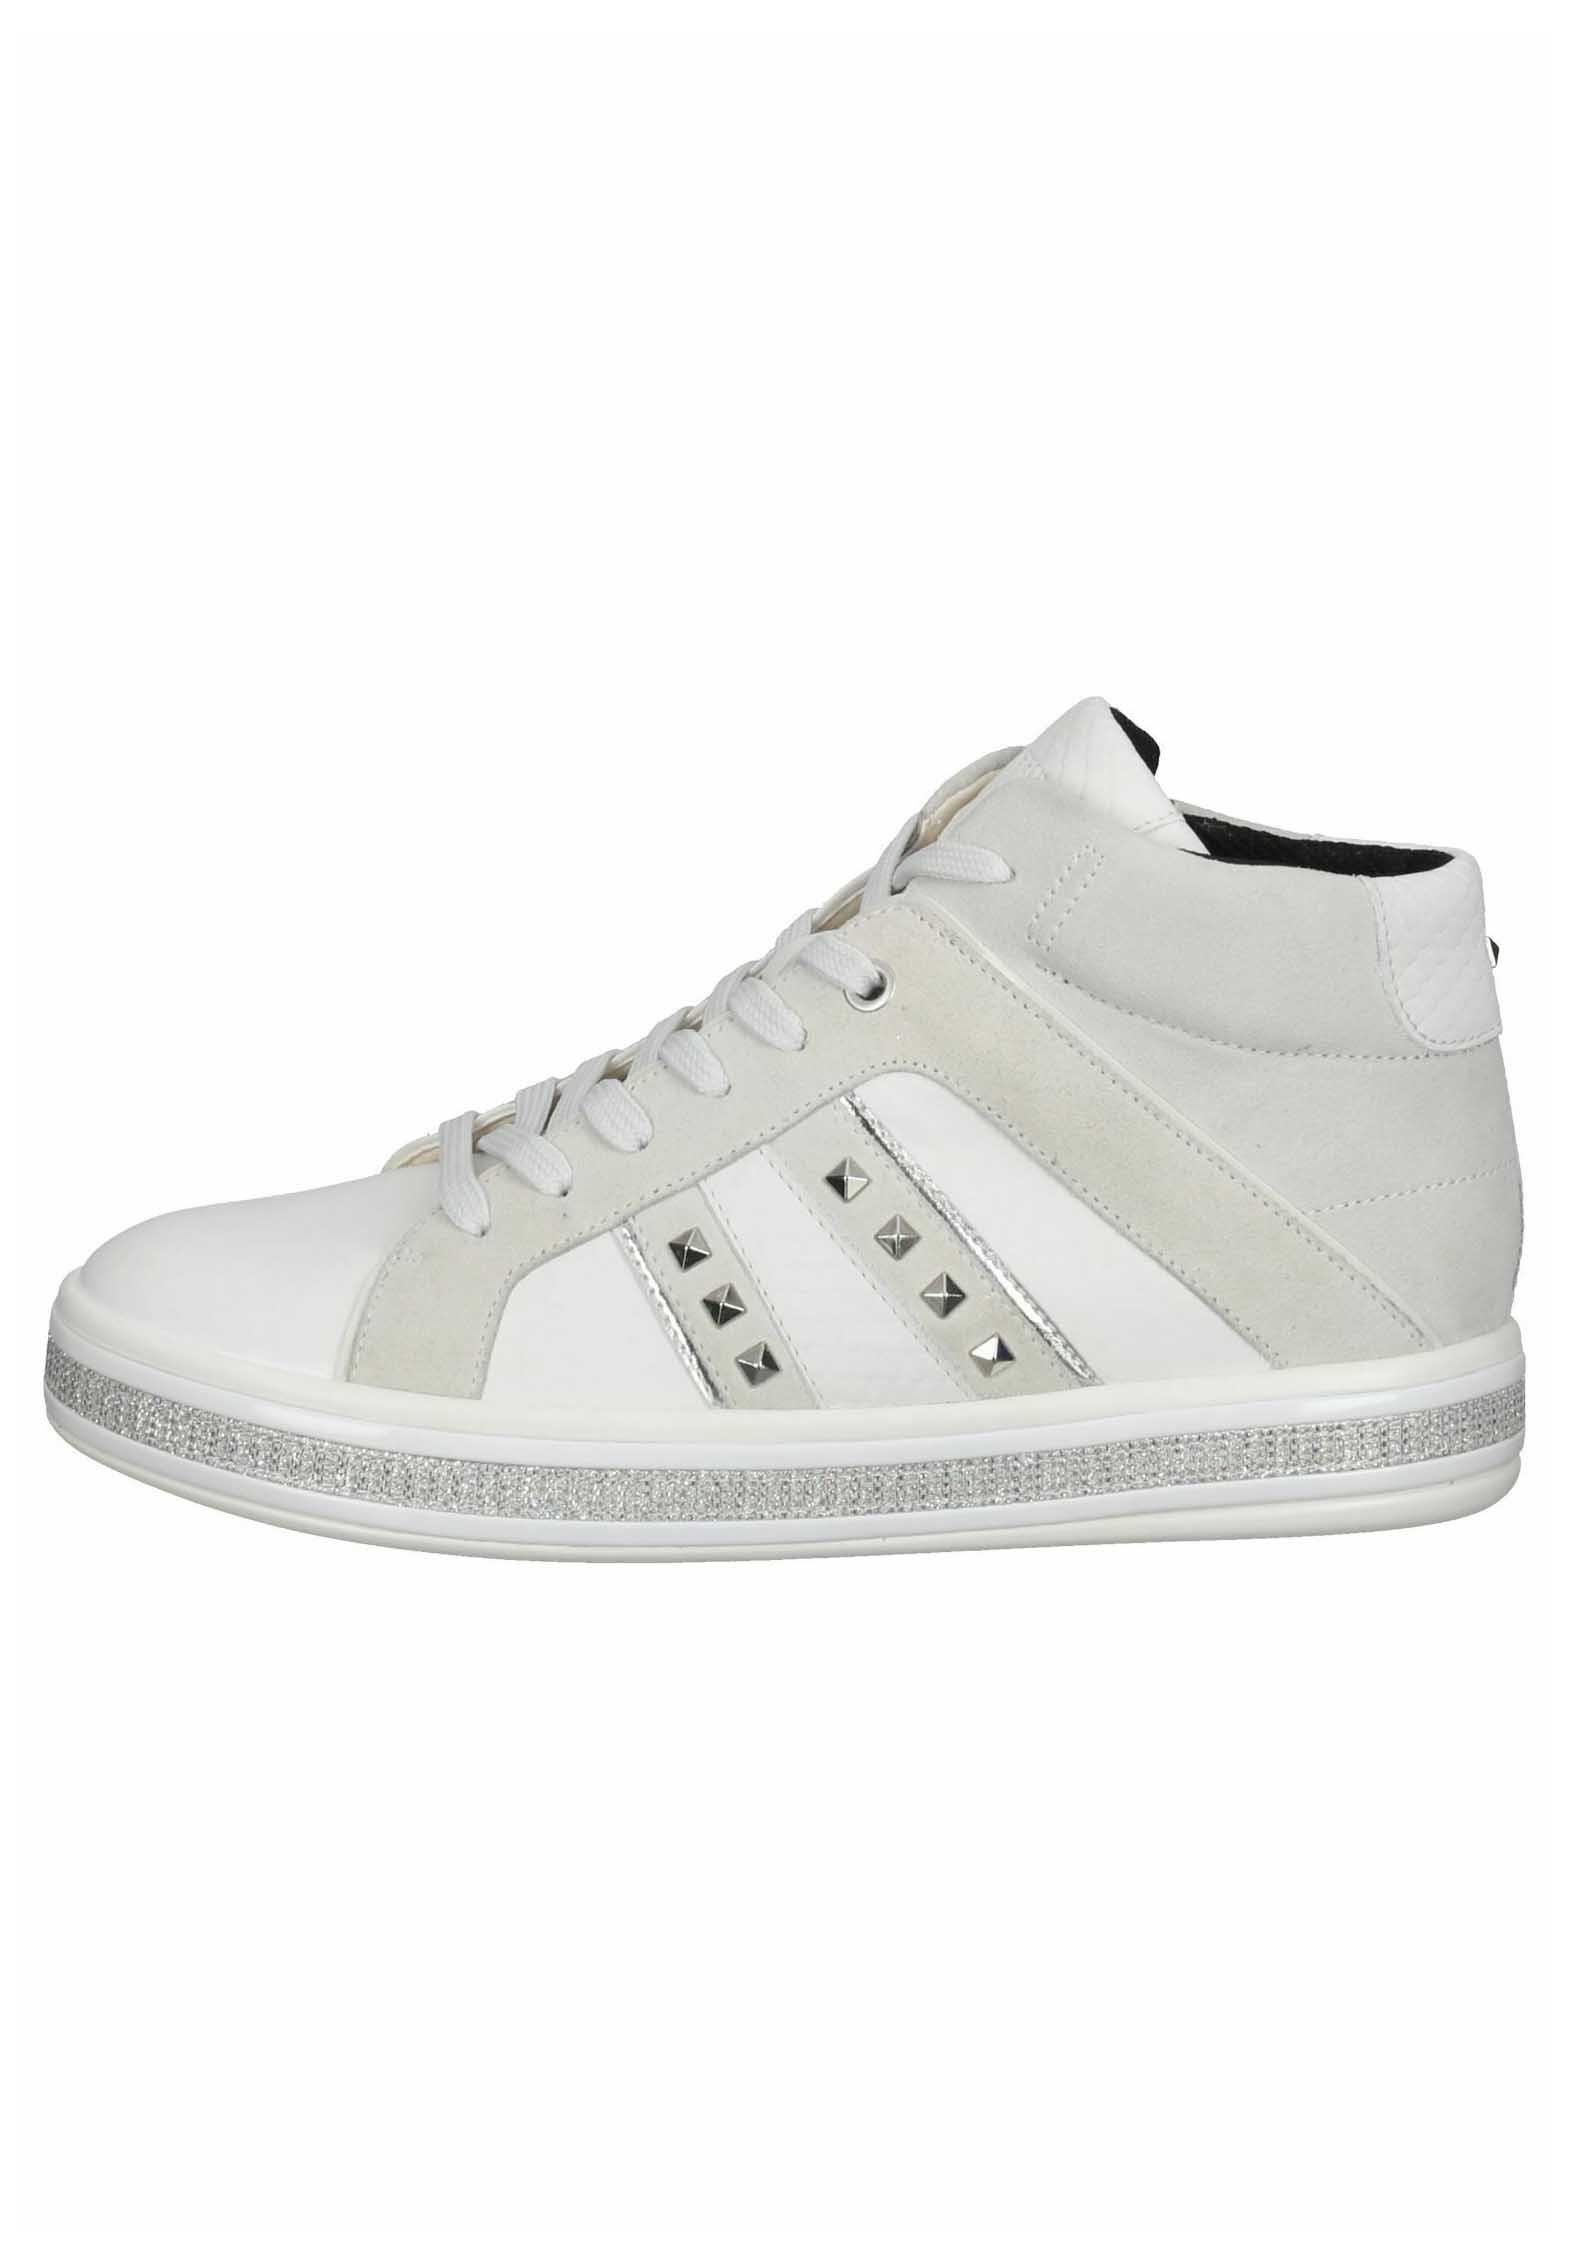 Femme Baskets basses - white/off white